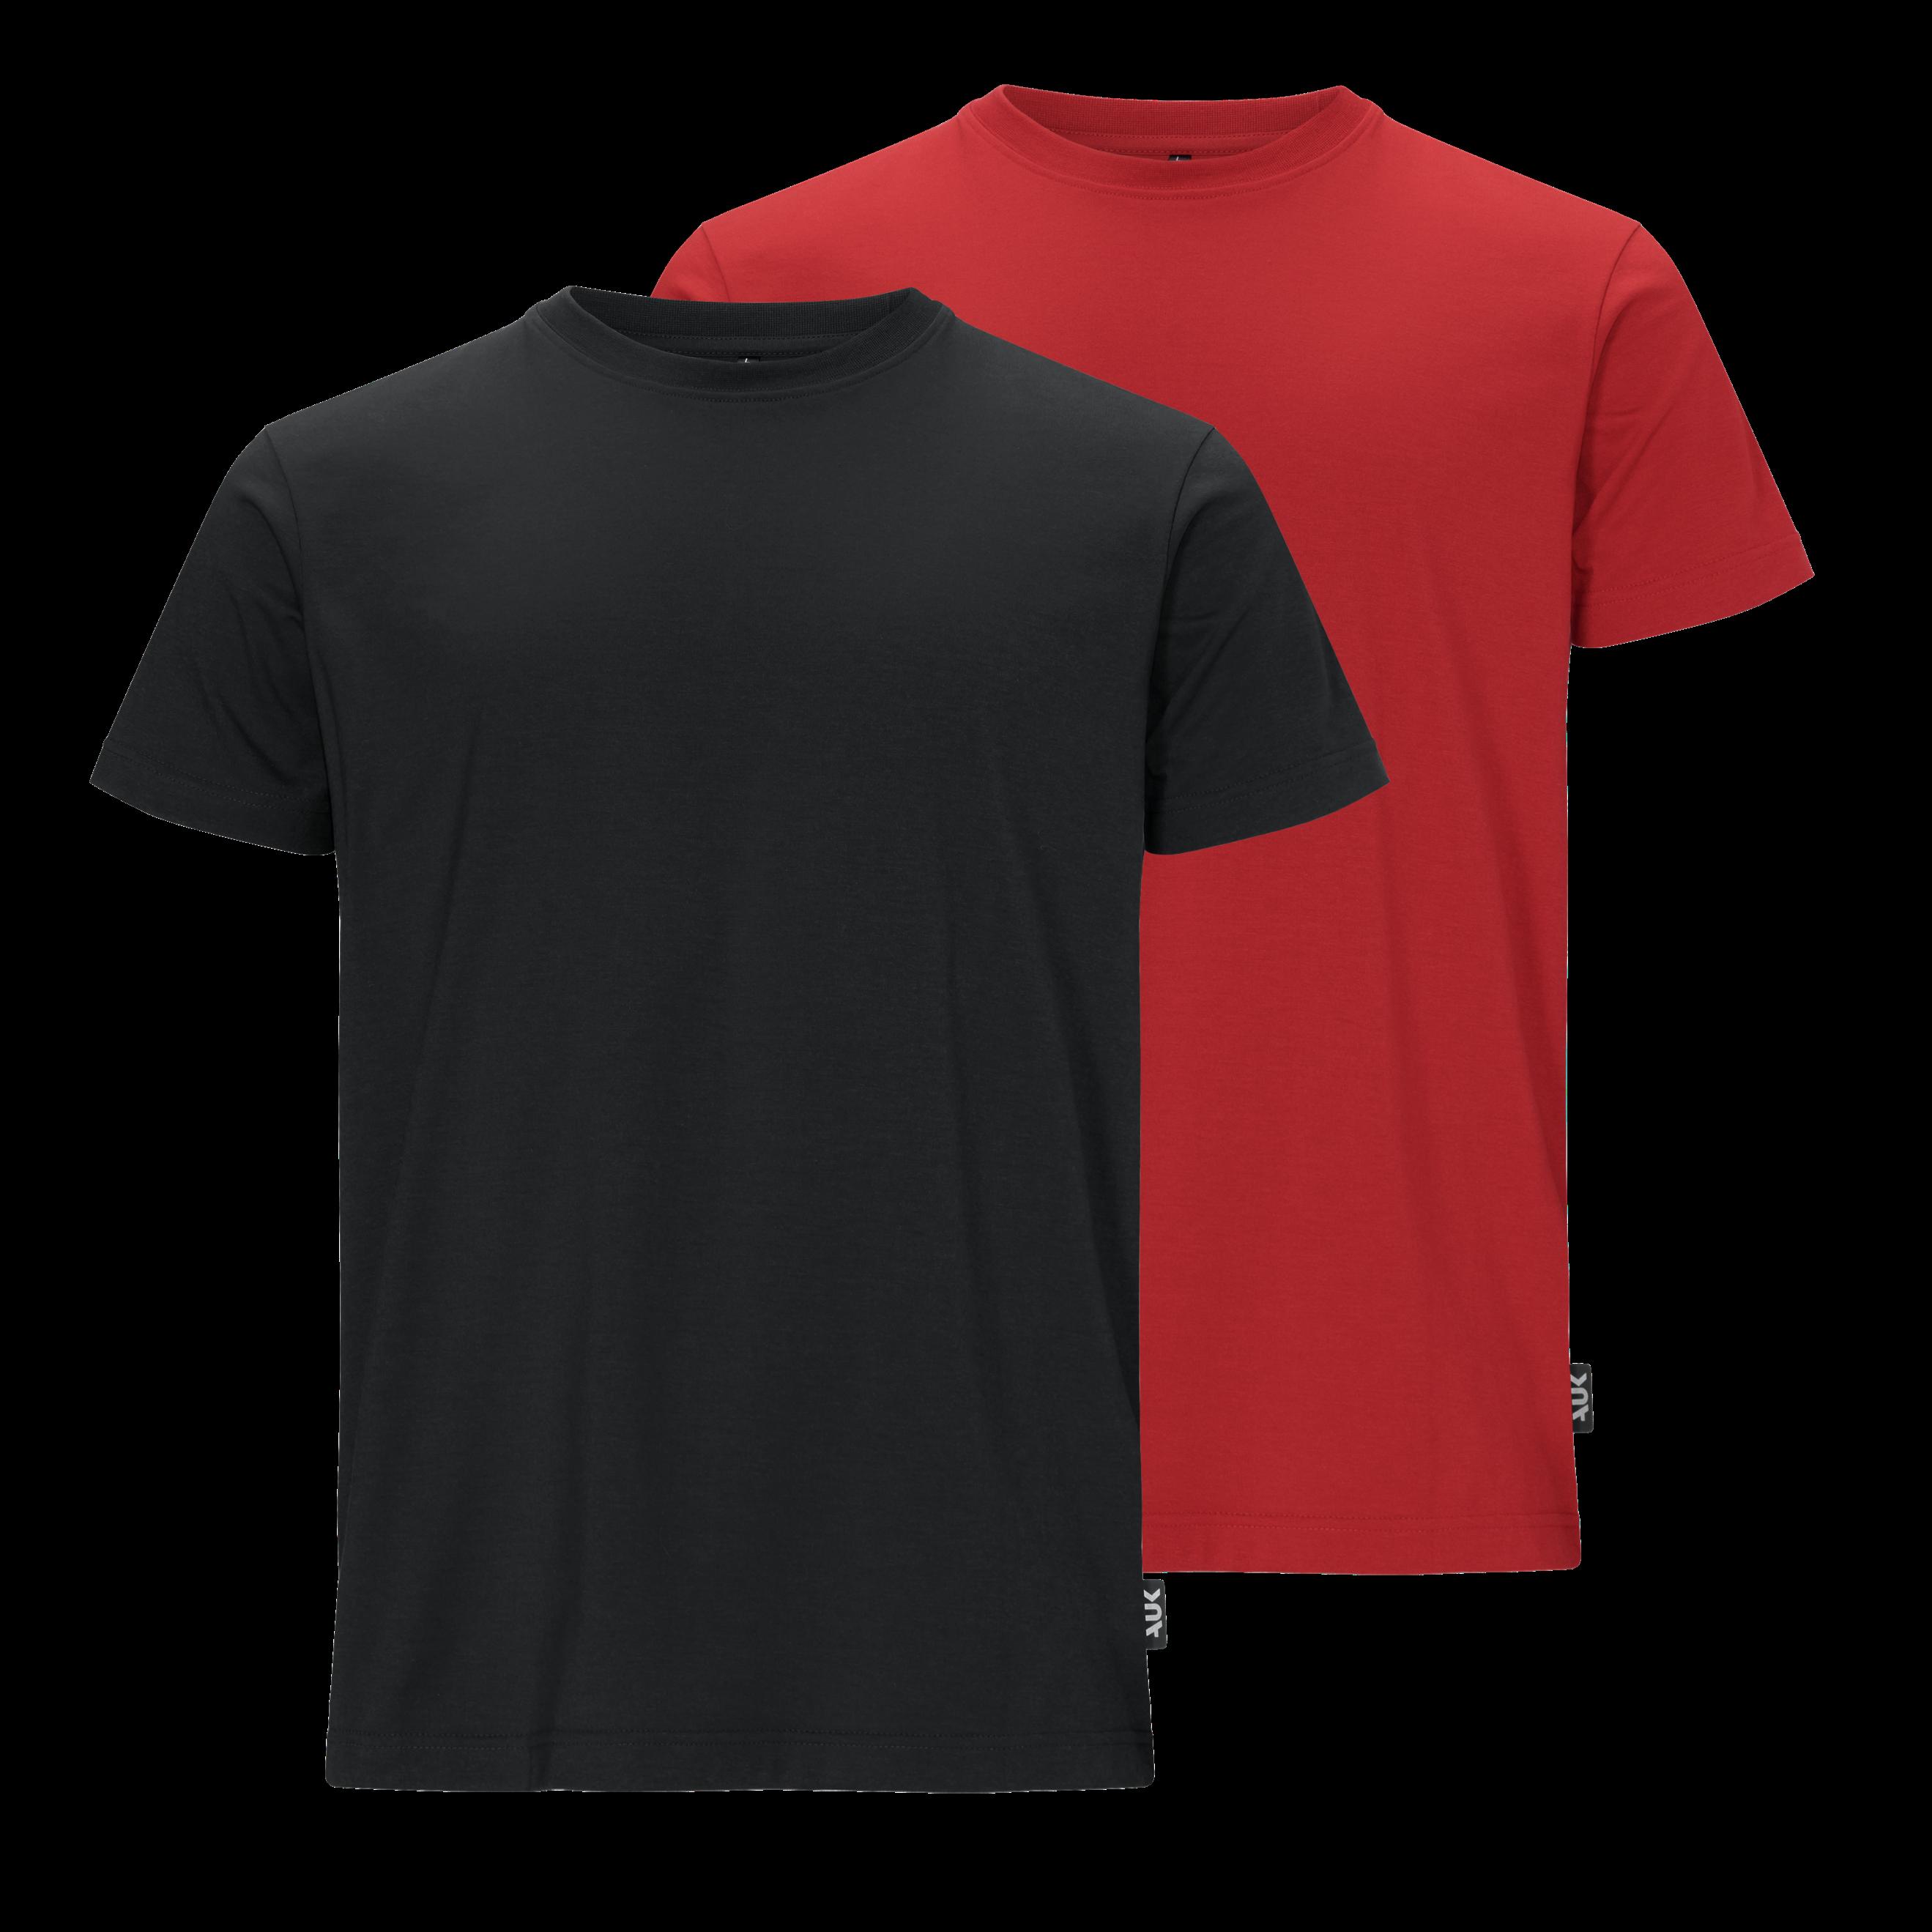 AUK t-shirt front web